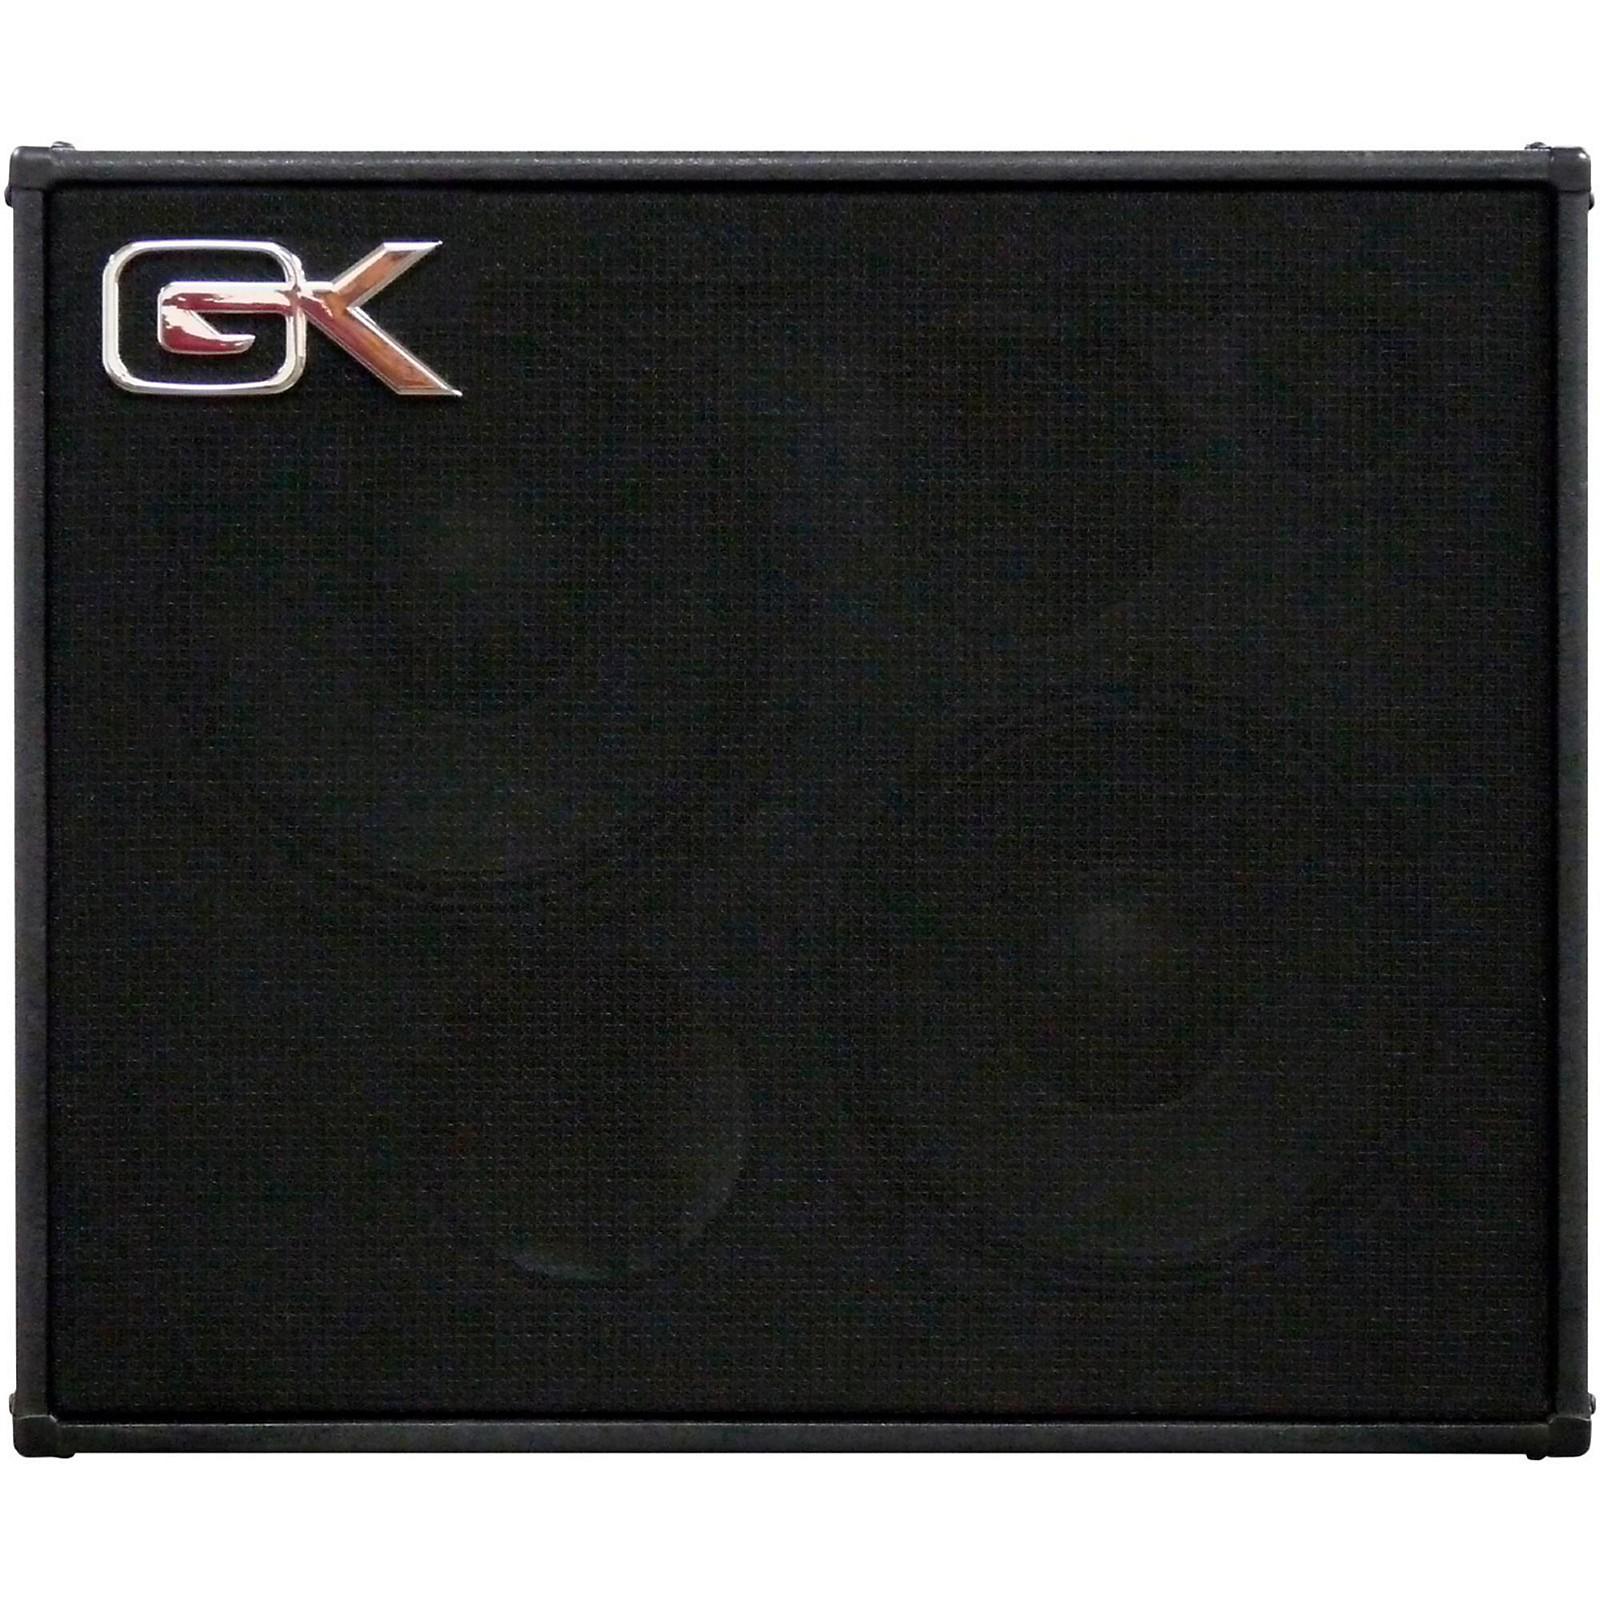 Gallien-Krueger CX210 400W 2x10 Bass Speaker Cabinet